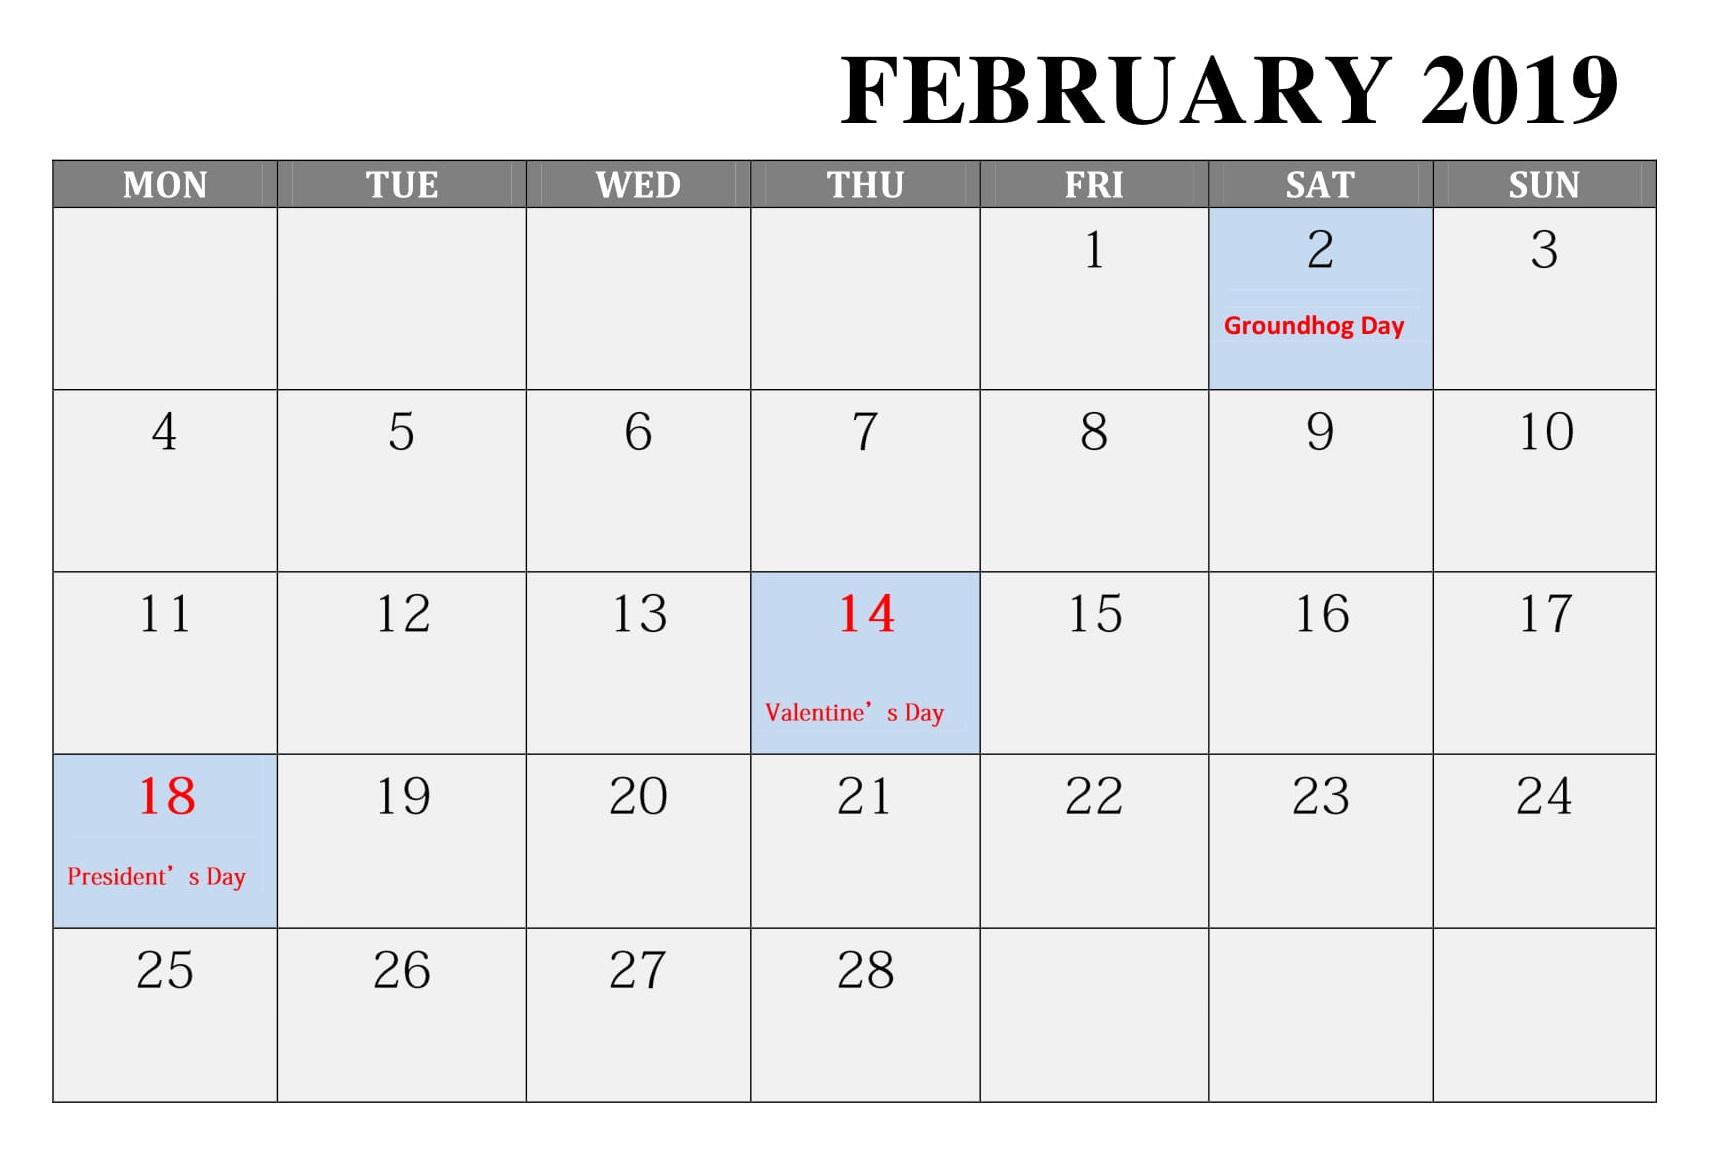 February 2019 Canada Calendar With Bank Holidays